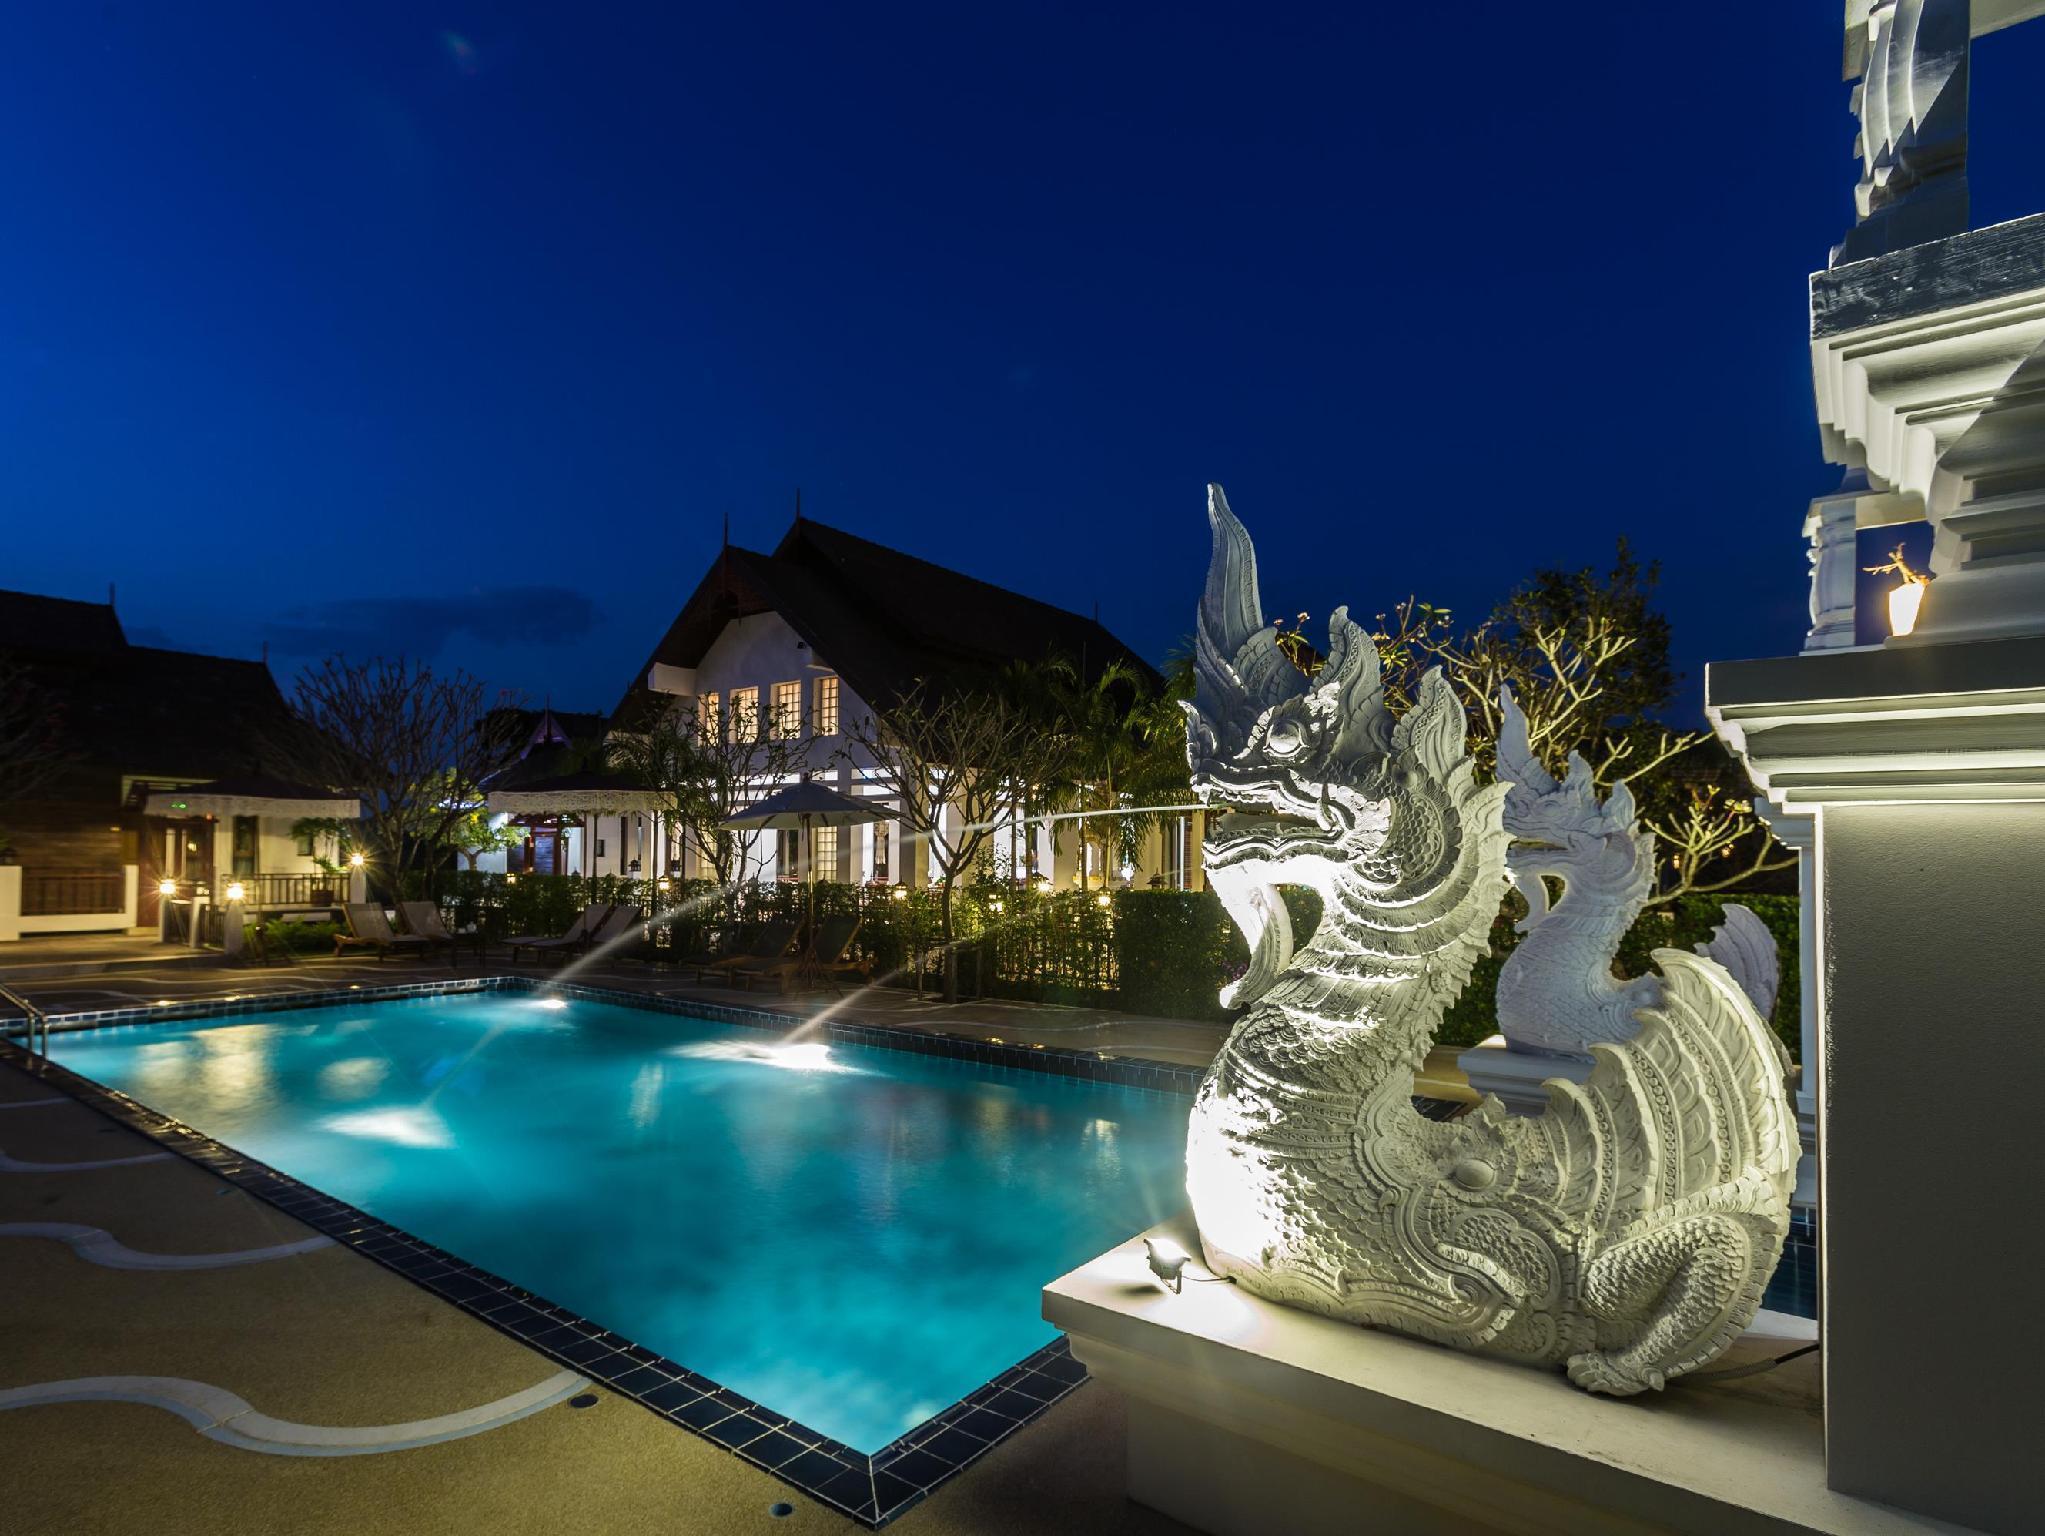 Doltara Boutique Resort ดลธารา บูทิก รีสอร์ต